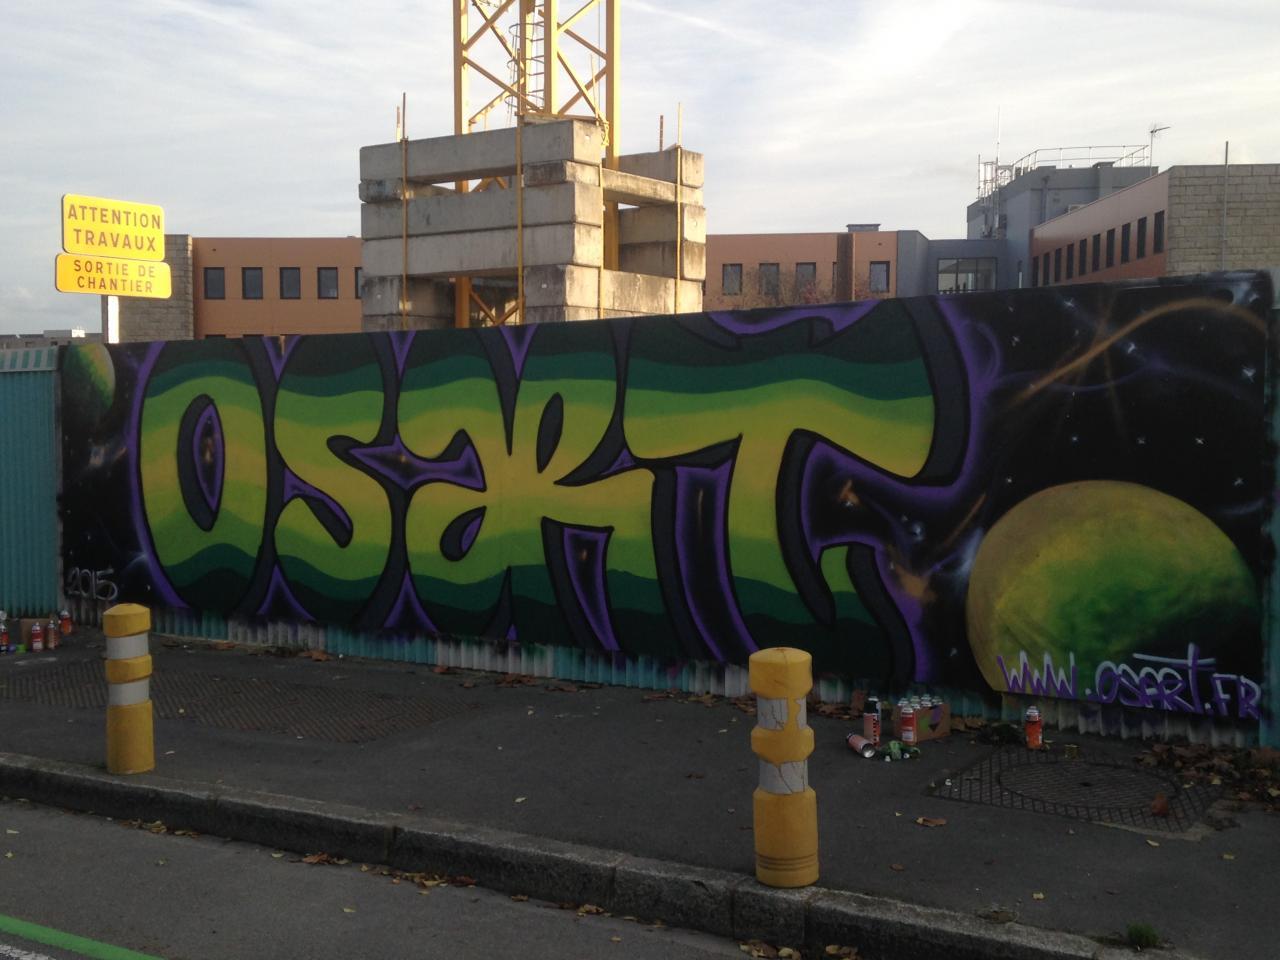 Graff Osart